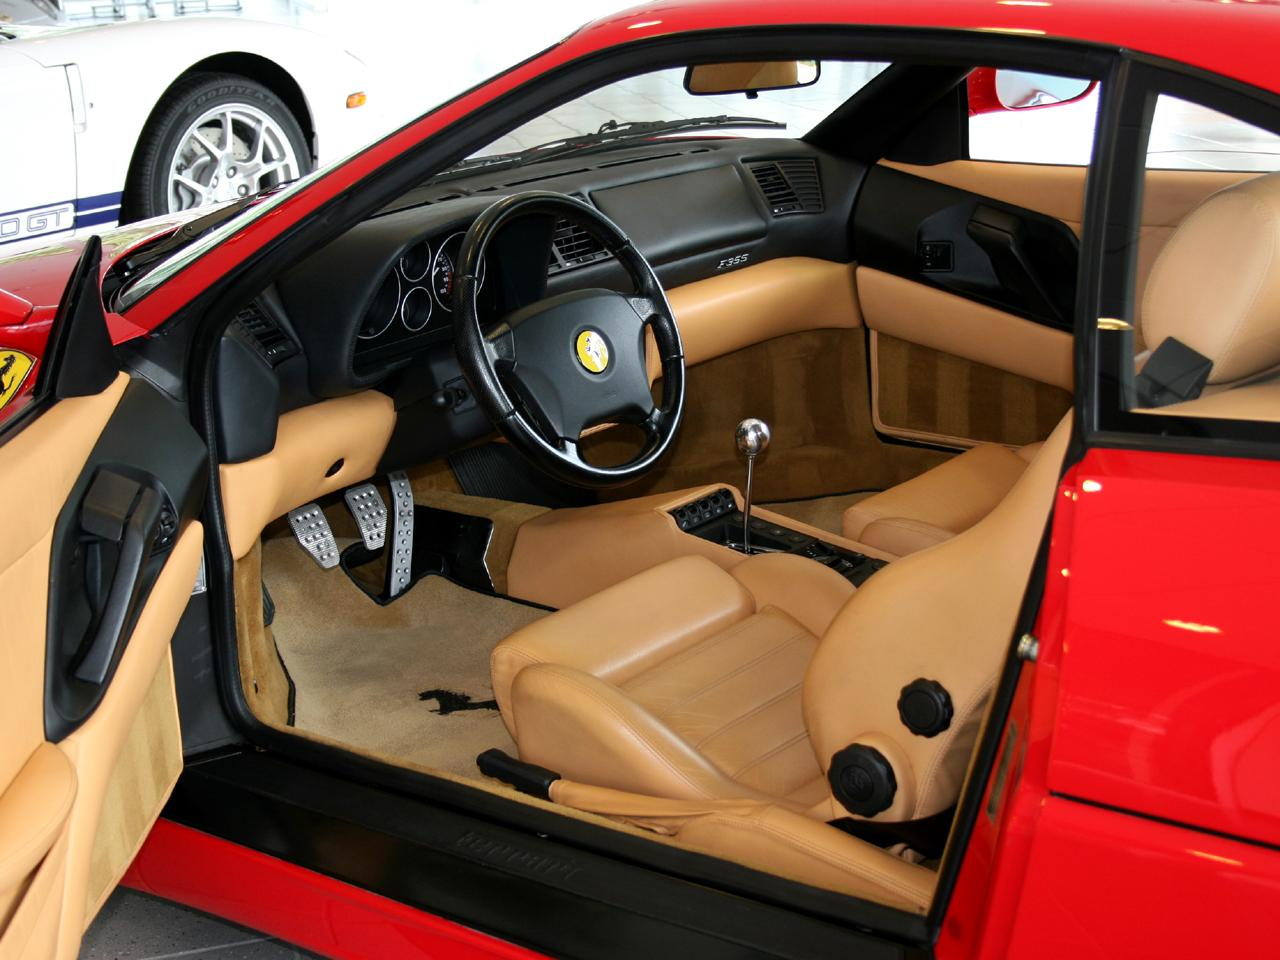 Ferrari F355 Review And Photos